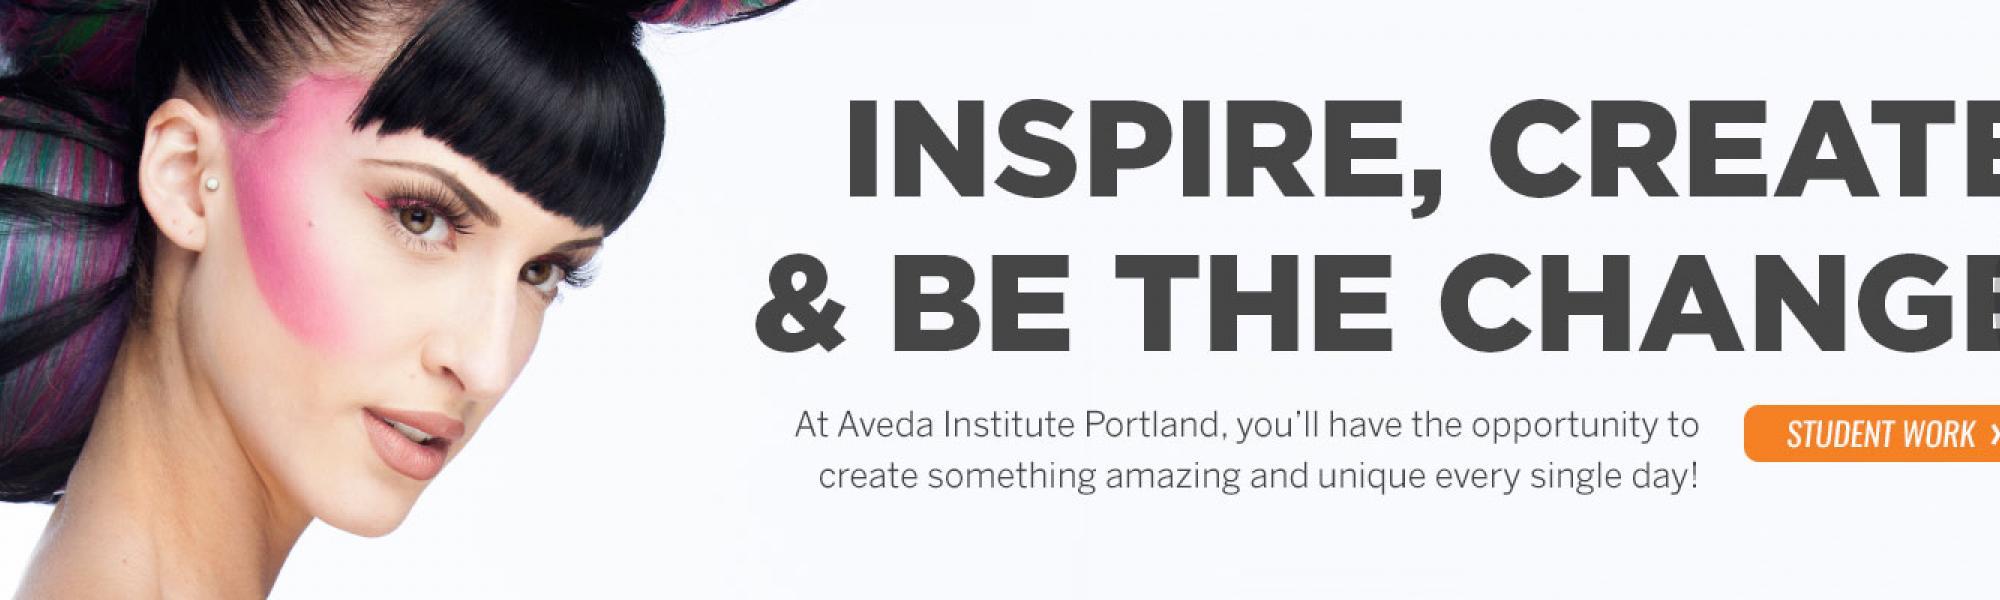 Inspire, Create, Change - Aveda Institute Portland